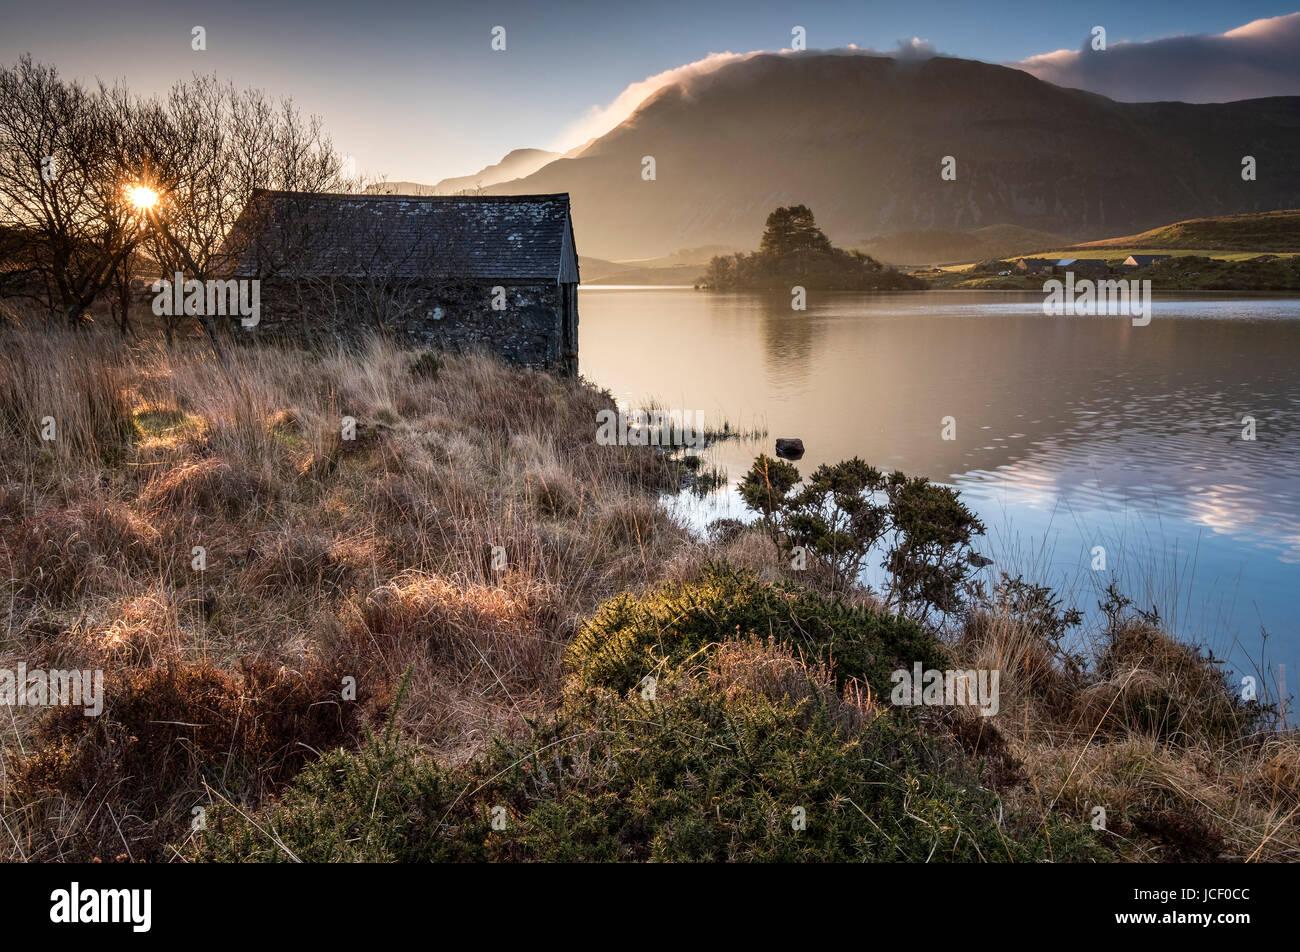 Dawn at Cregennan Lakes backed by Cadair Idris, Snowdonia National Park, Gwynedd, North Wales - Stock Image